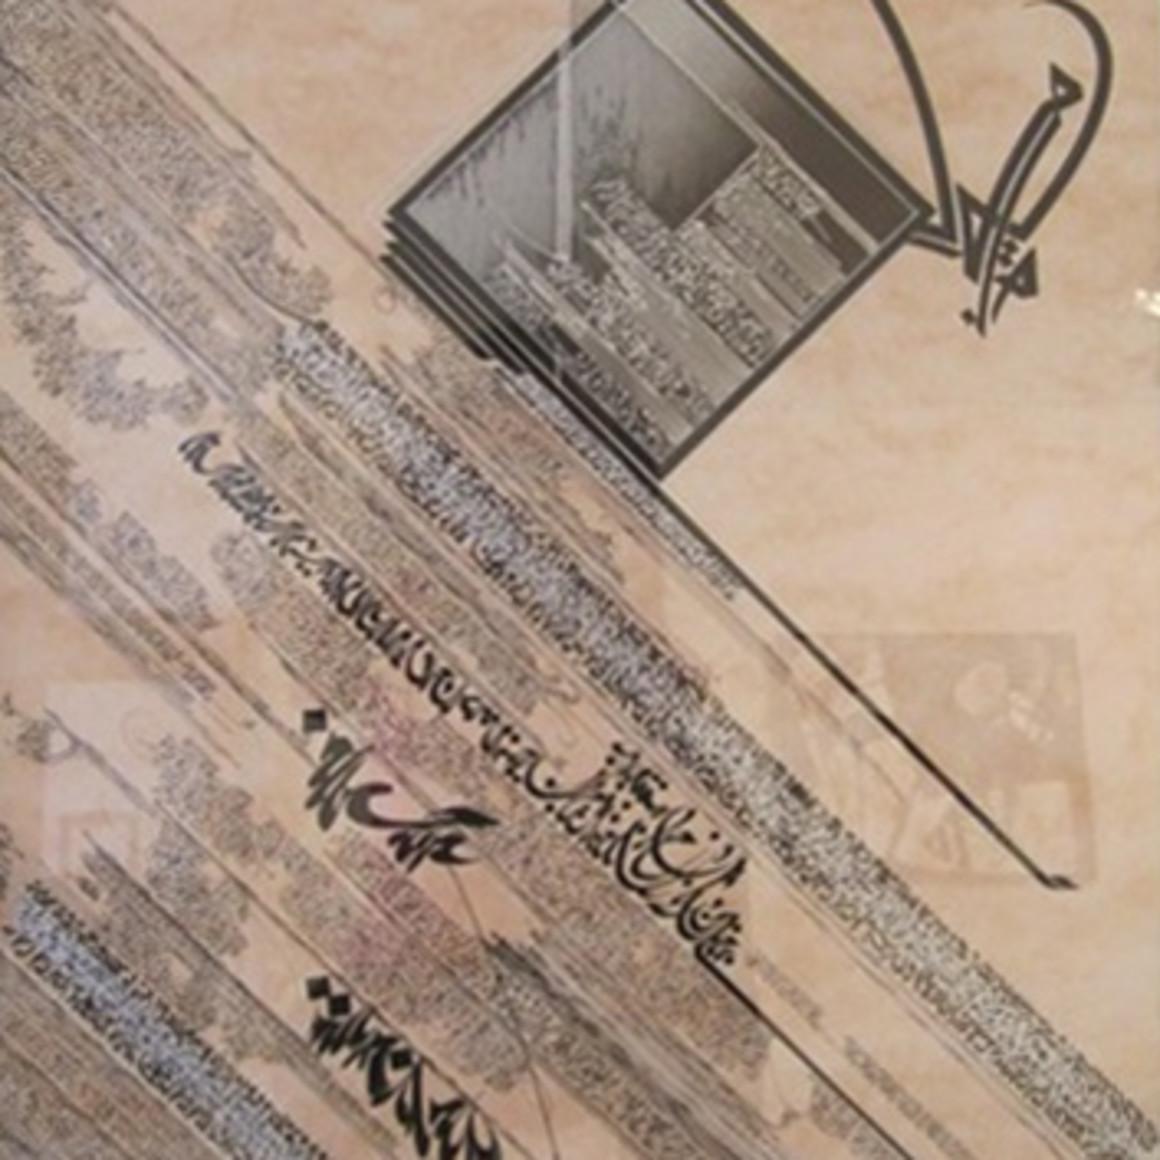 Nja Mahdaoui, Untitled, 1991